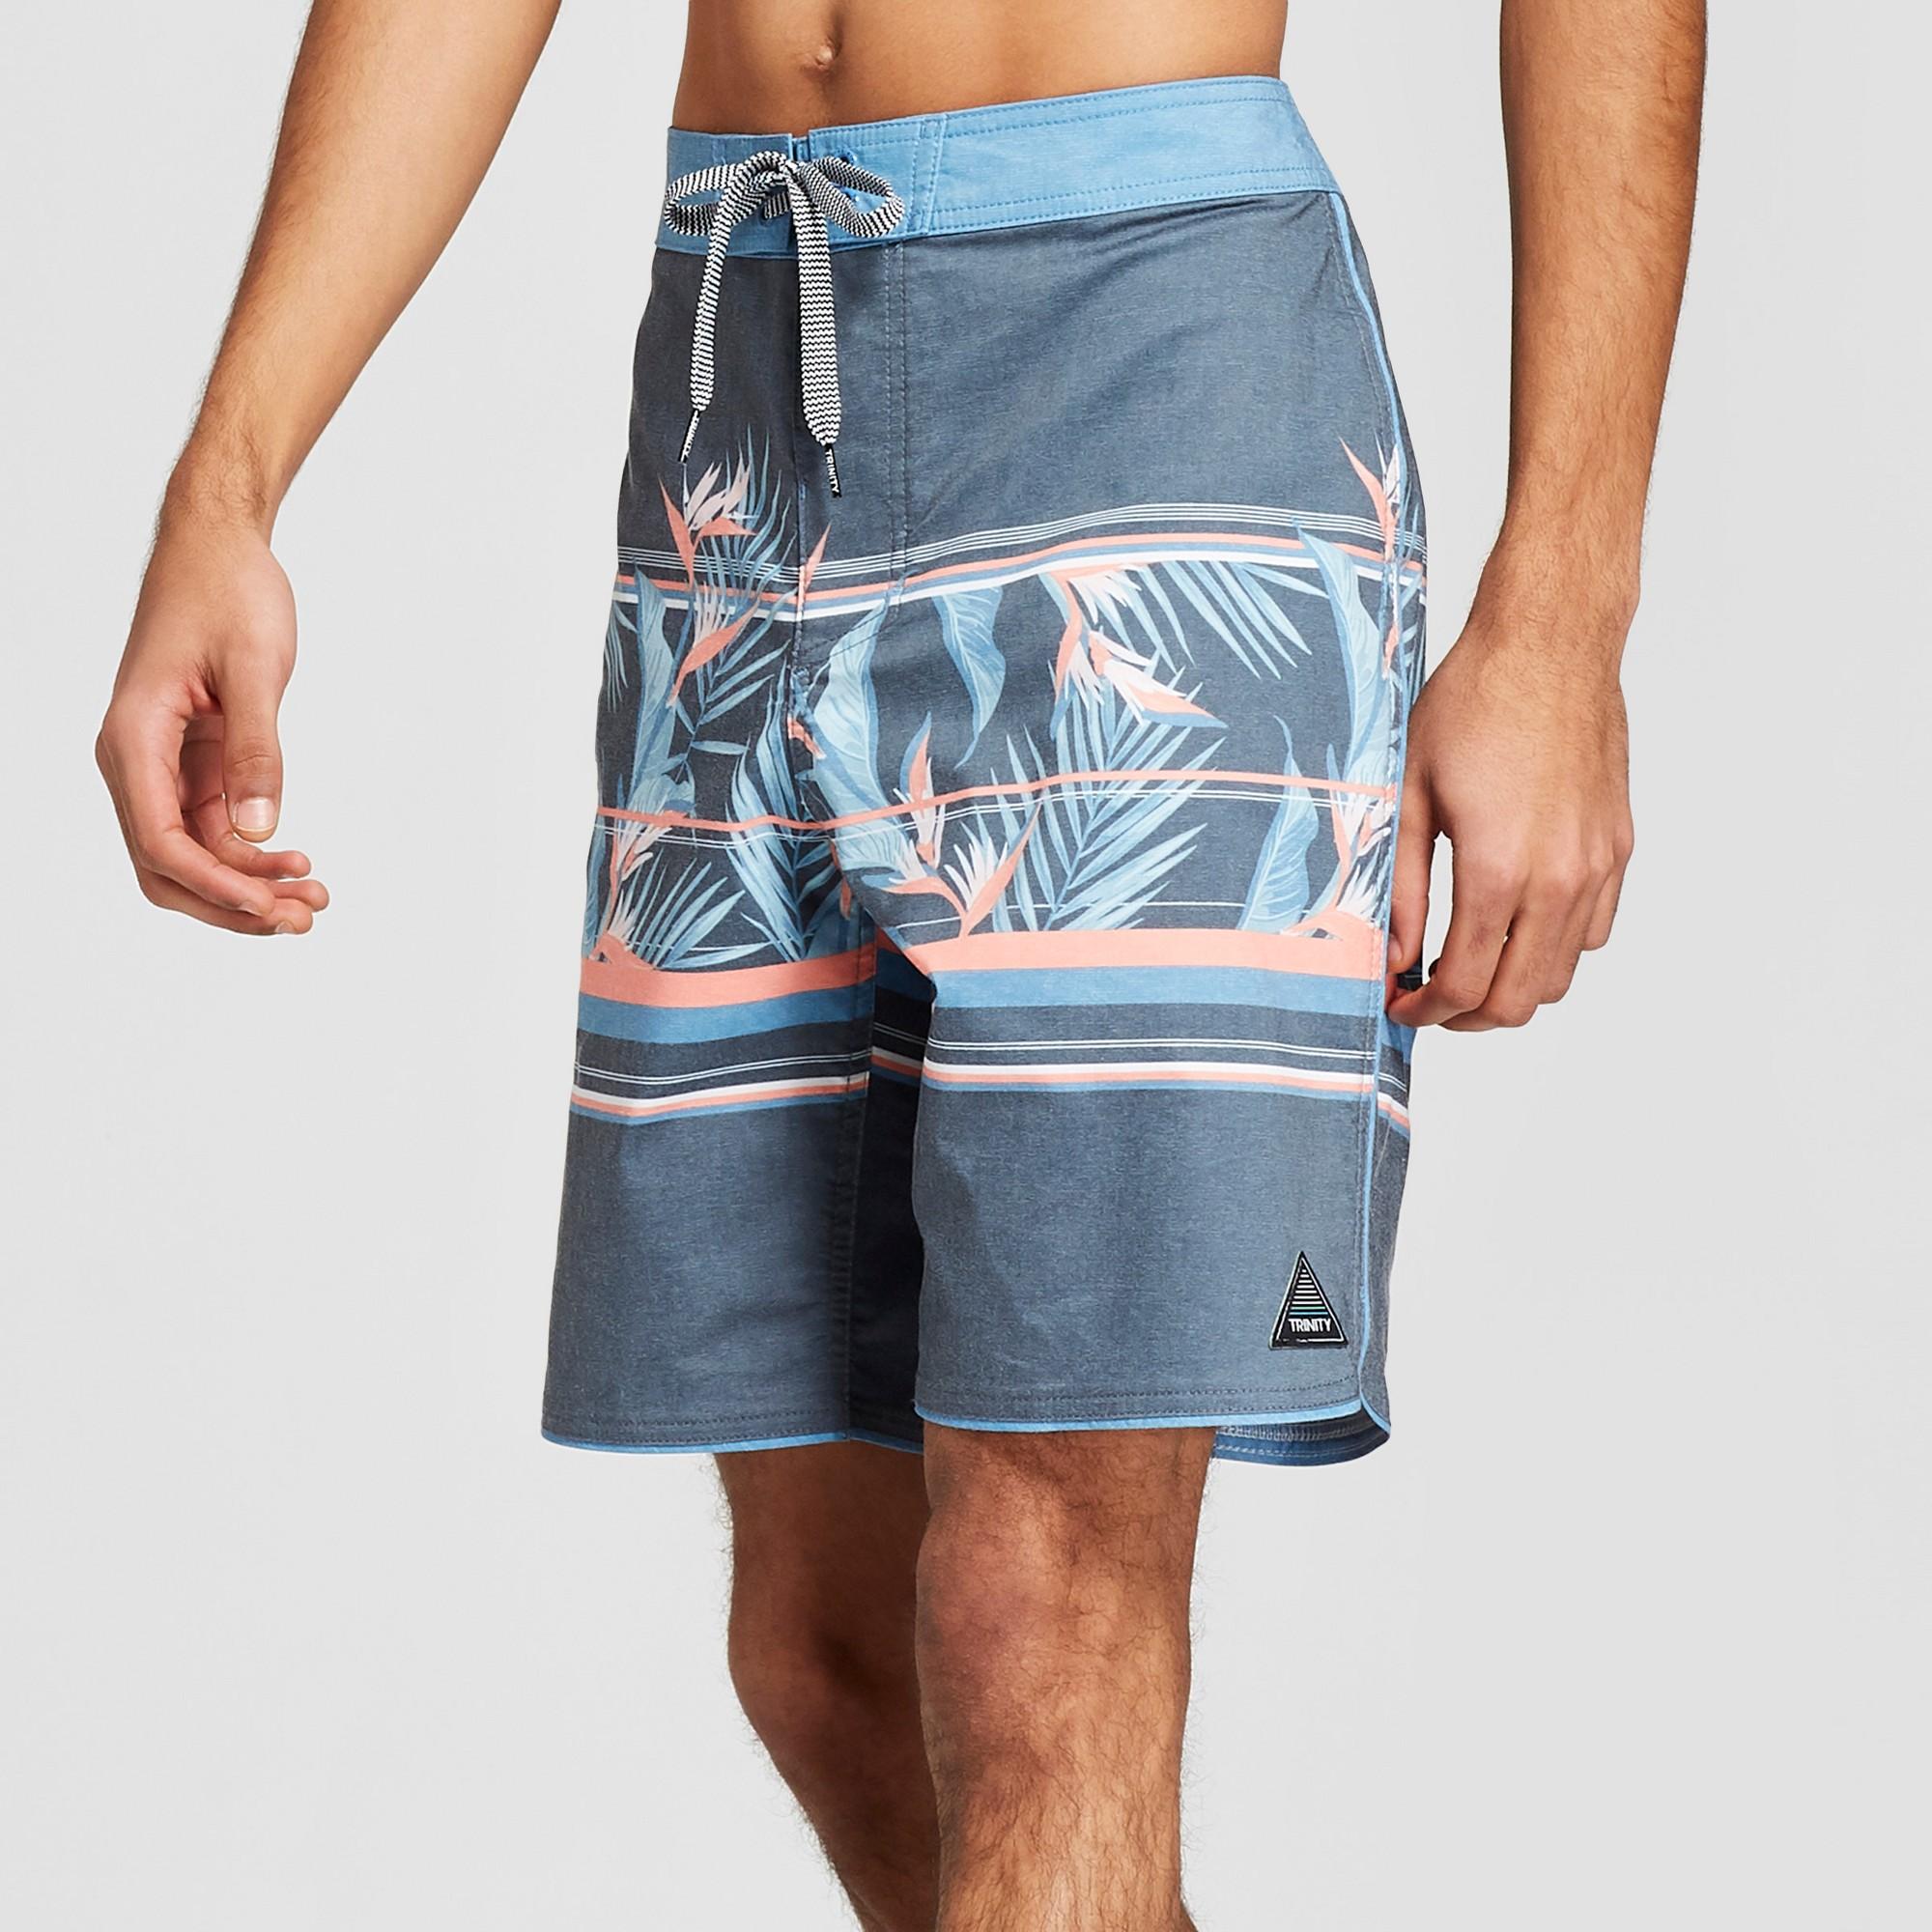 465d15b10e Men's Striped 8.5 Veracruz Scallop Board Shorts - Trinity Navy 32, Blue